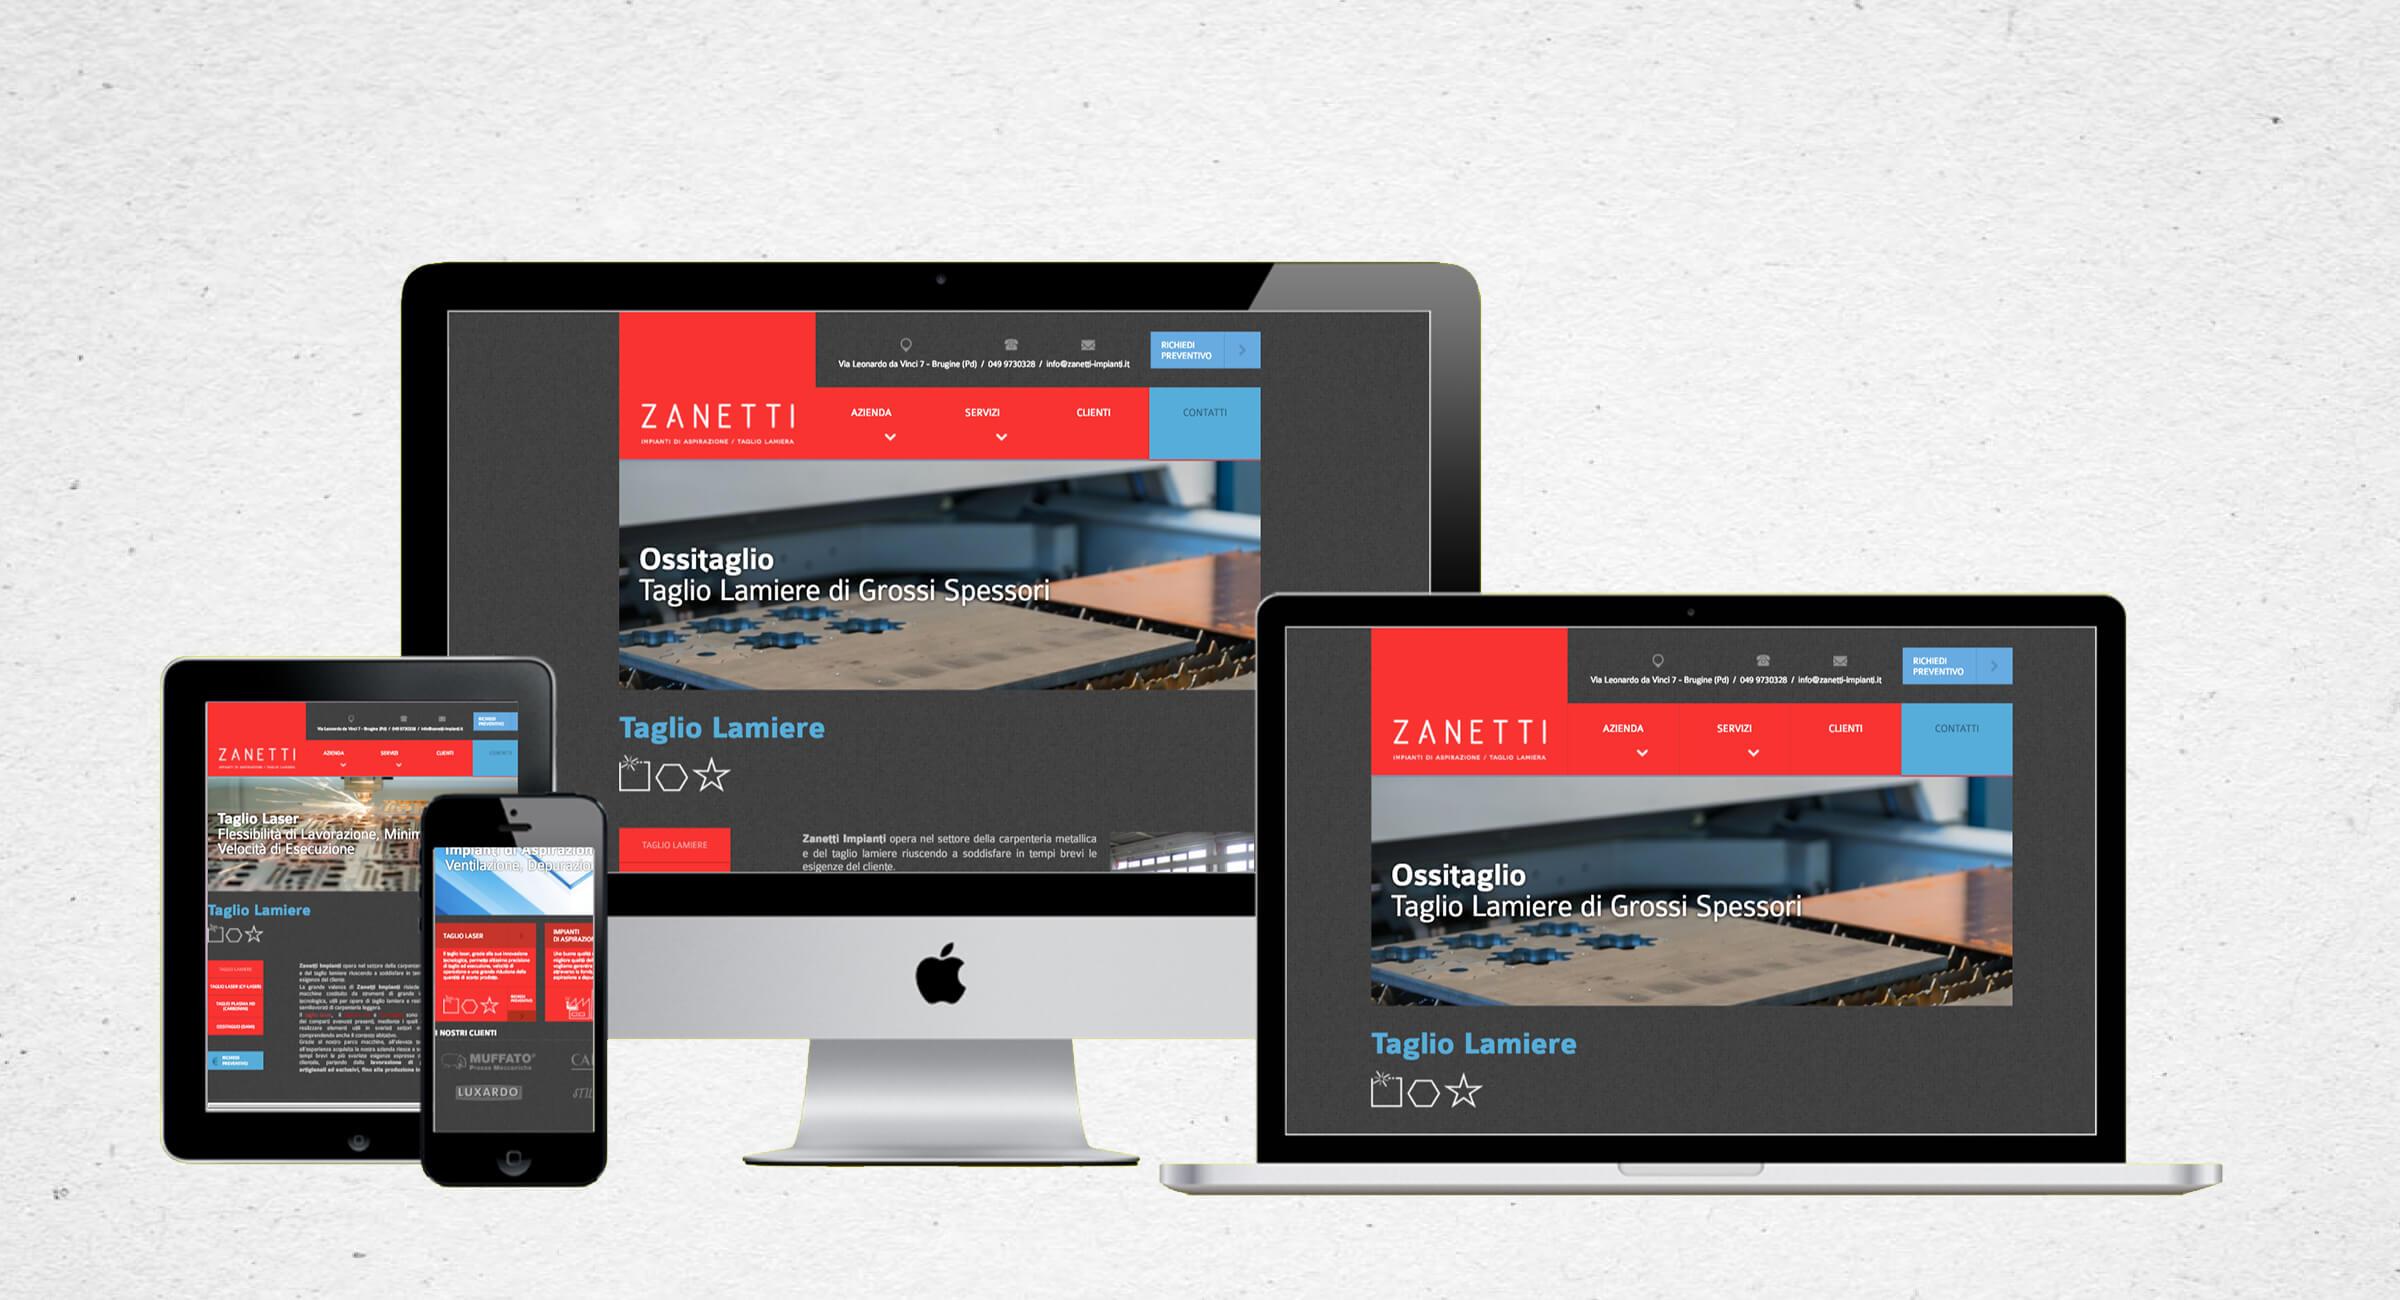 Zanetti-Impianti-sito-internet-OnOff-web-agency (1)